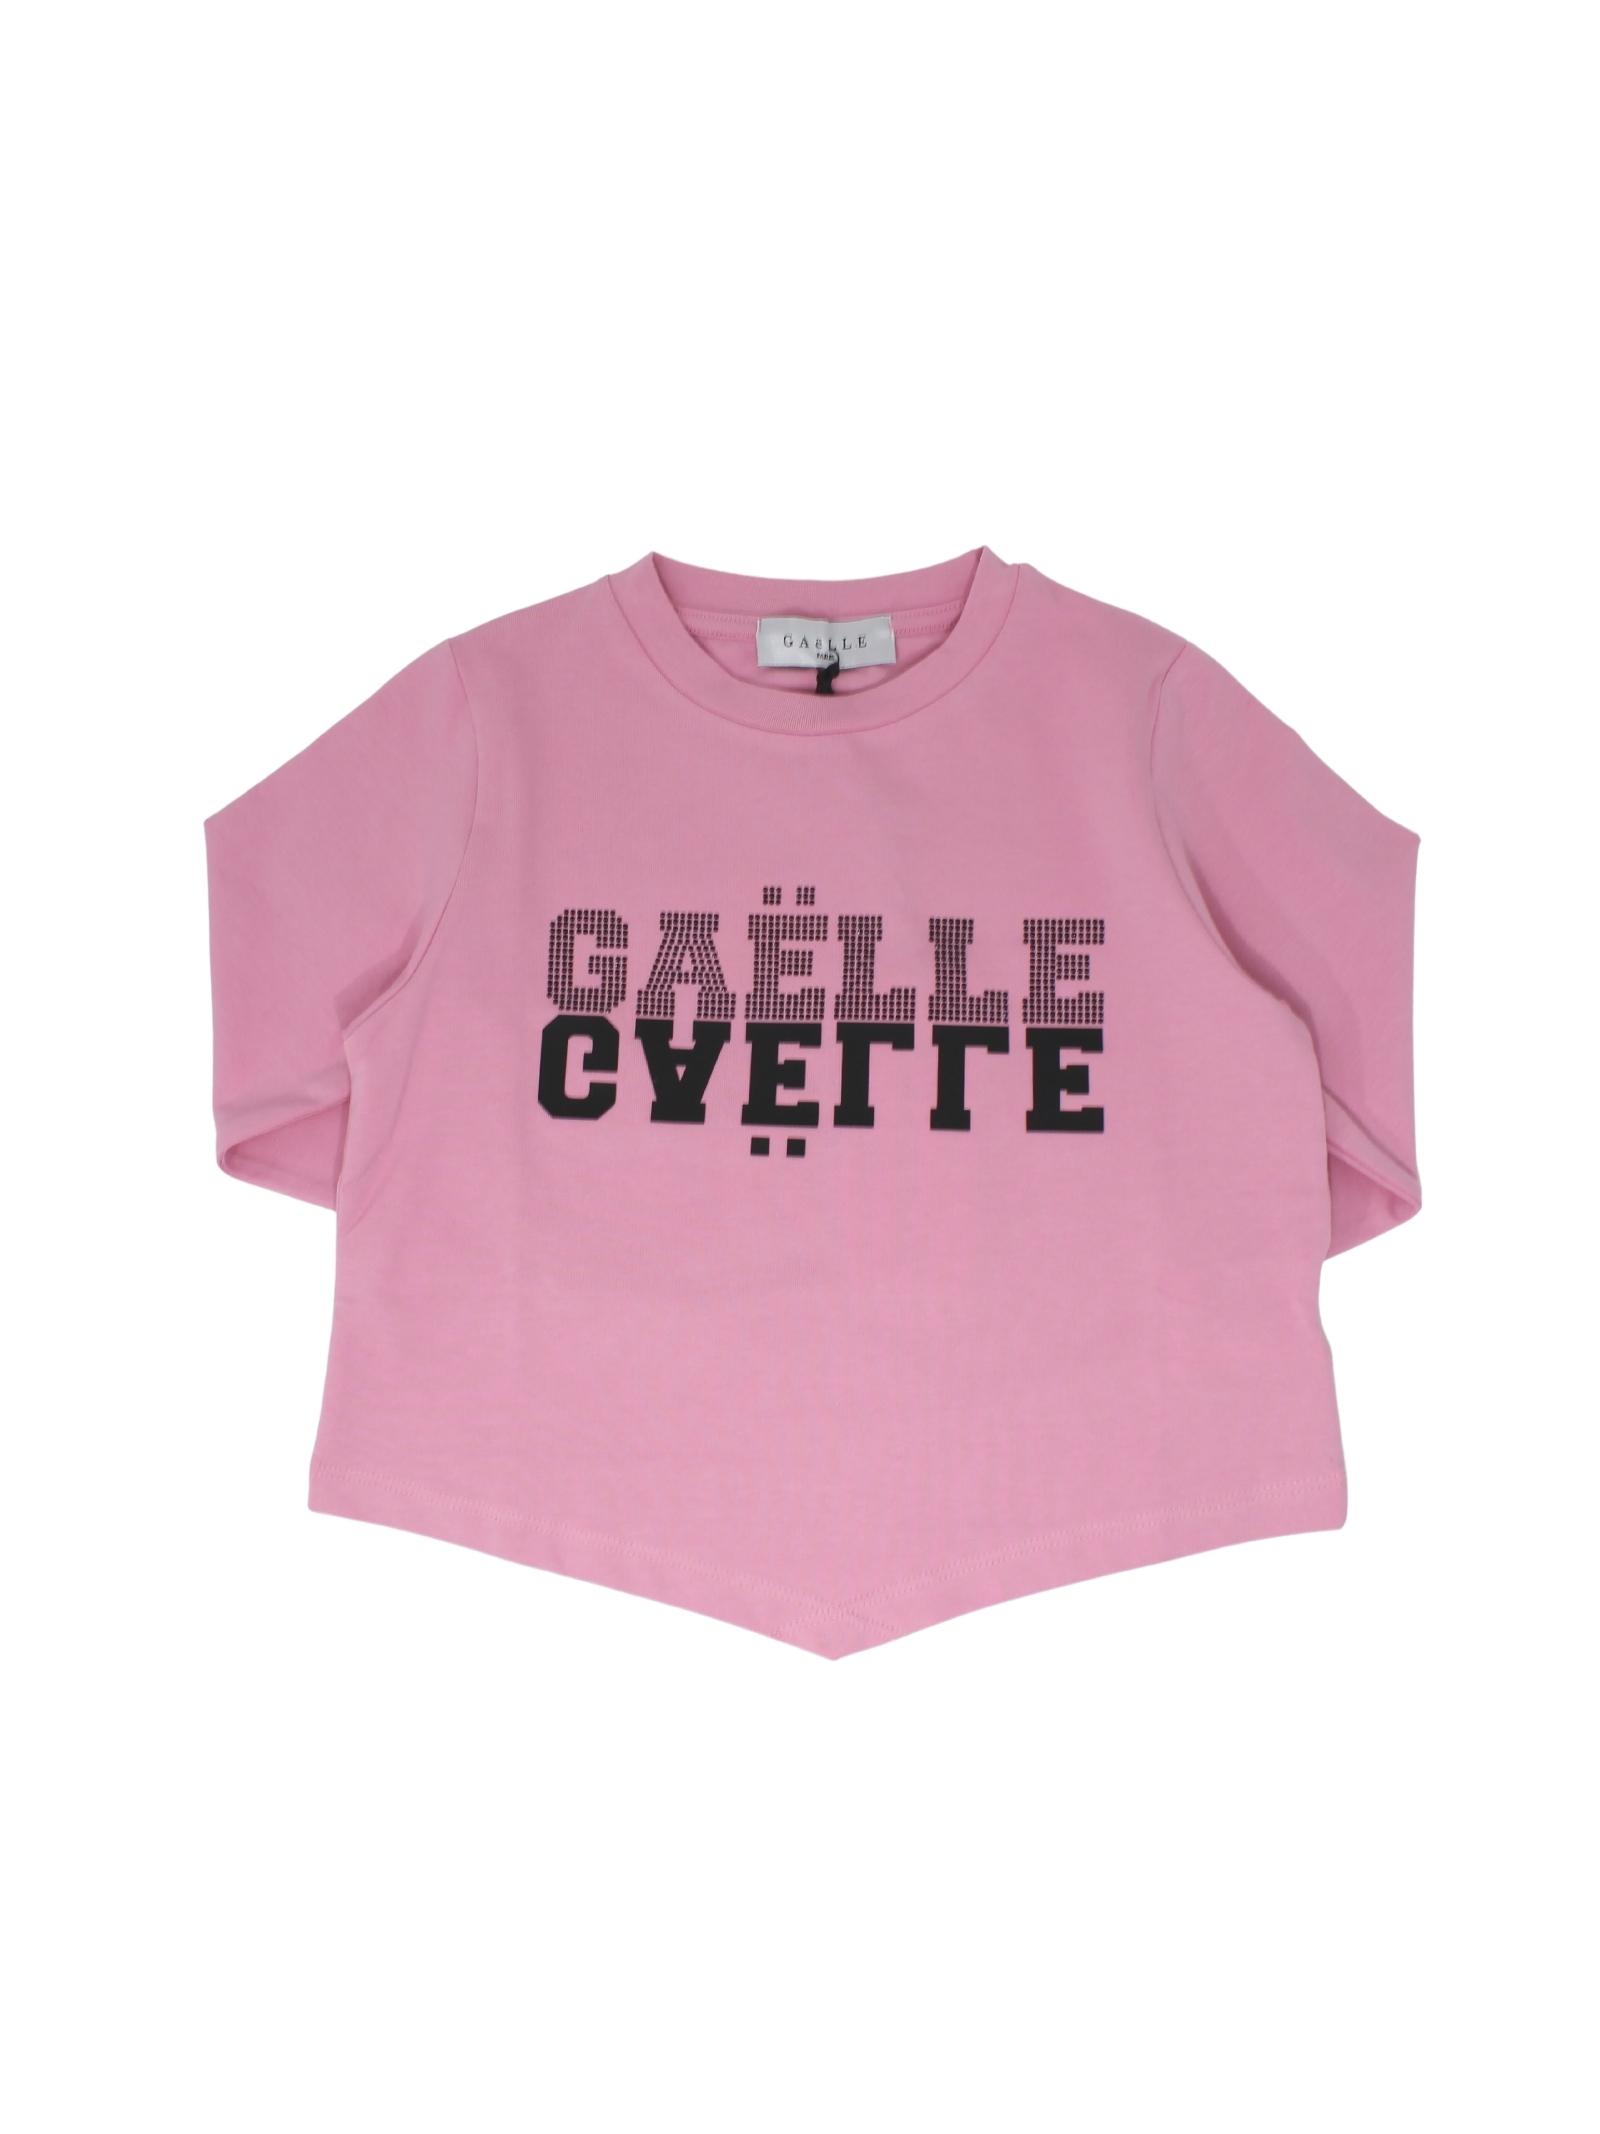 T-shirt Basic Pink Bambina, GAËLLE PARIS KIDS | Maglie | 2741M0326MLROSA